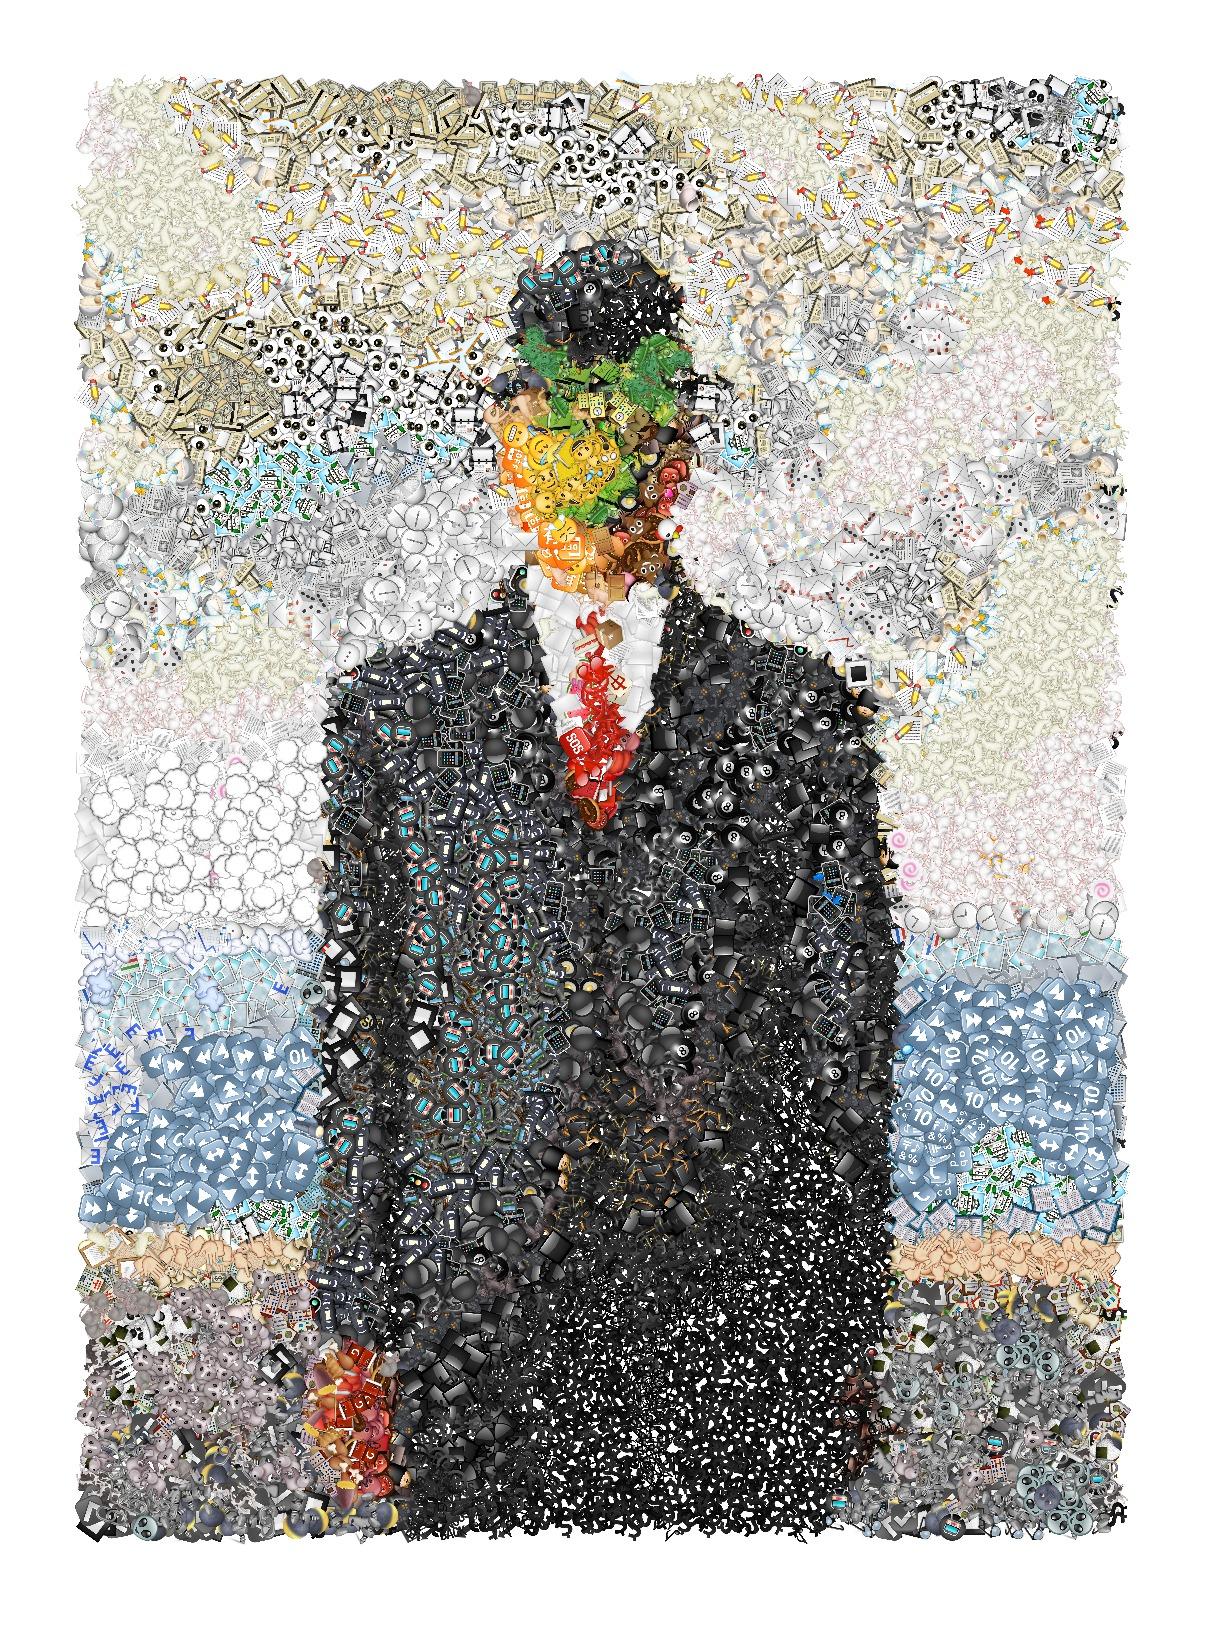 emoji-mosaic (11)